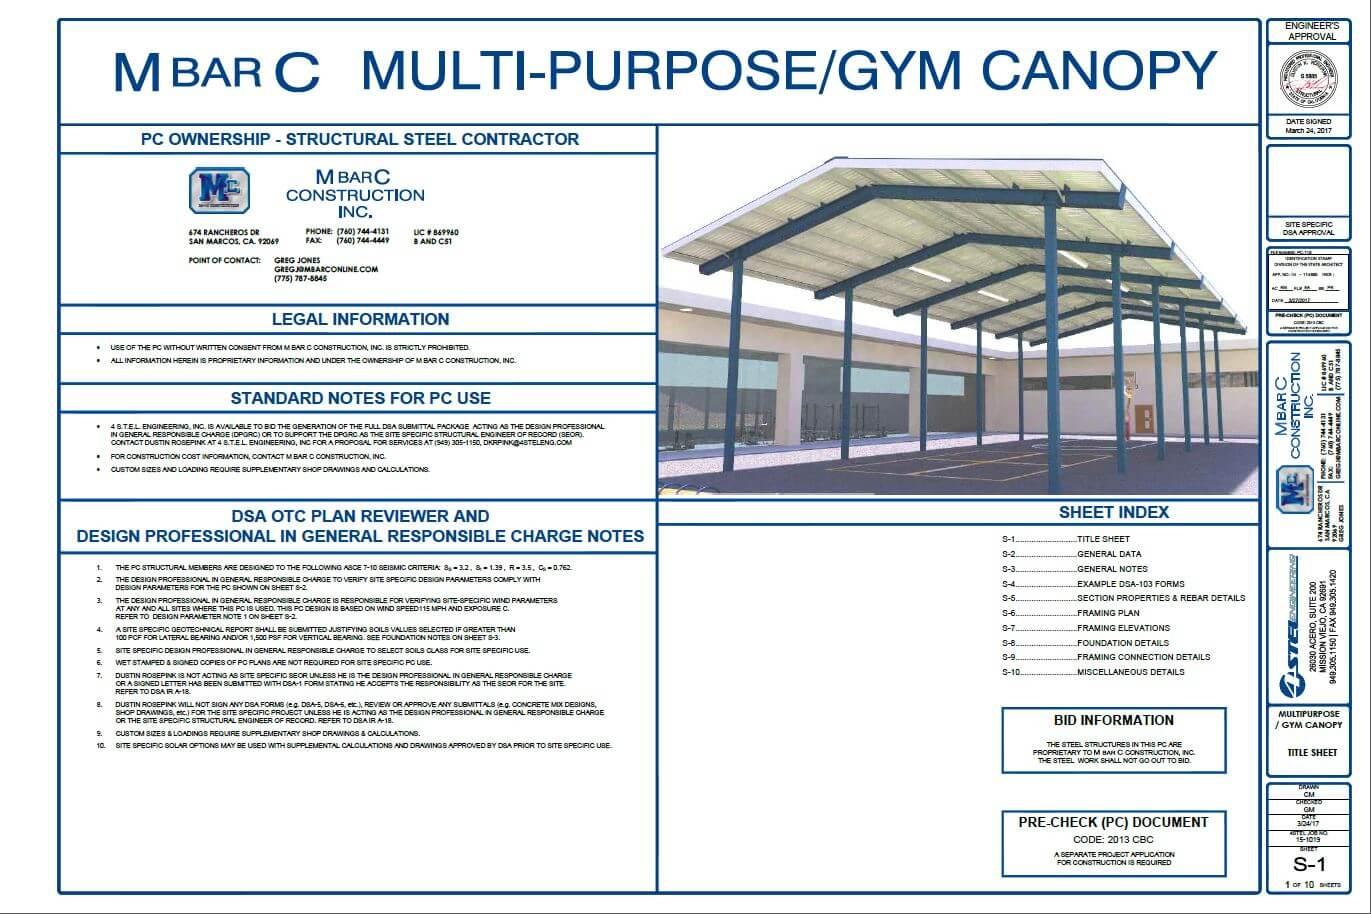 Multi-Purpose/Gym Canopy